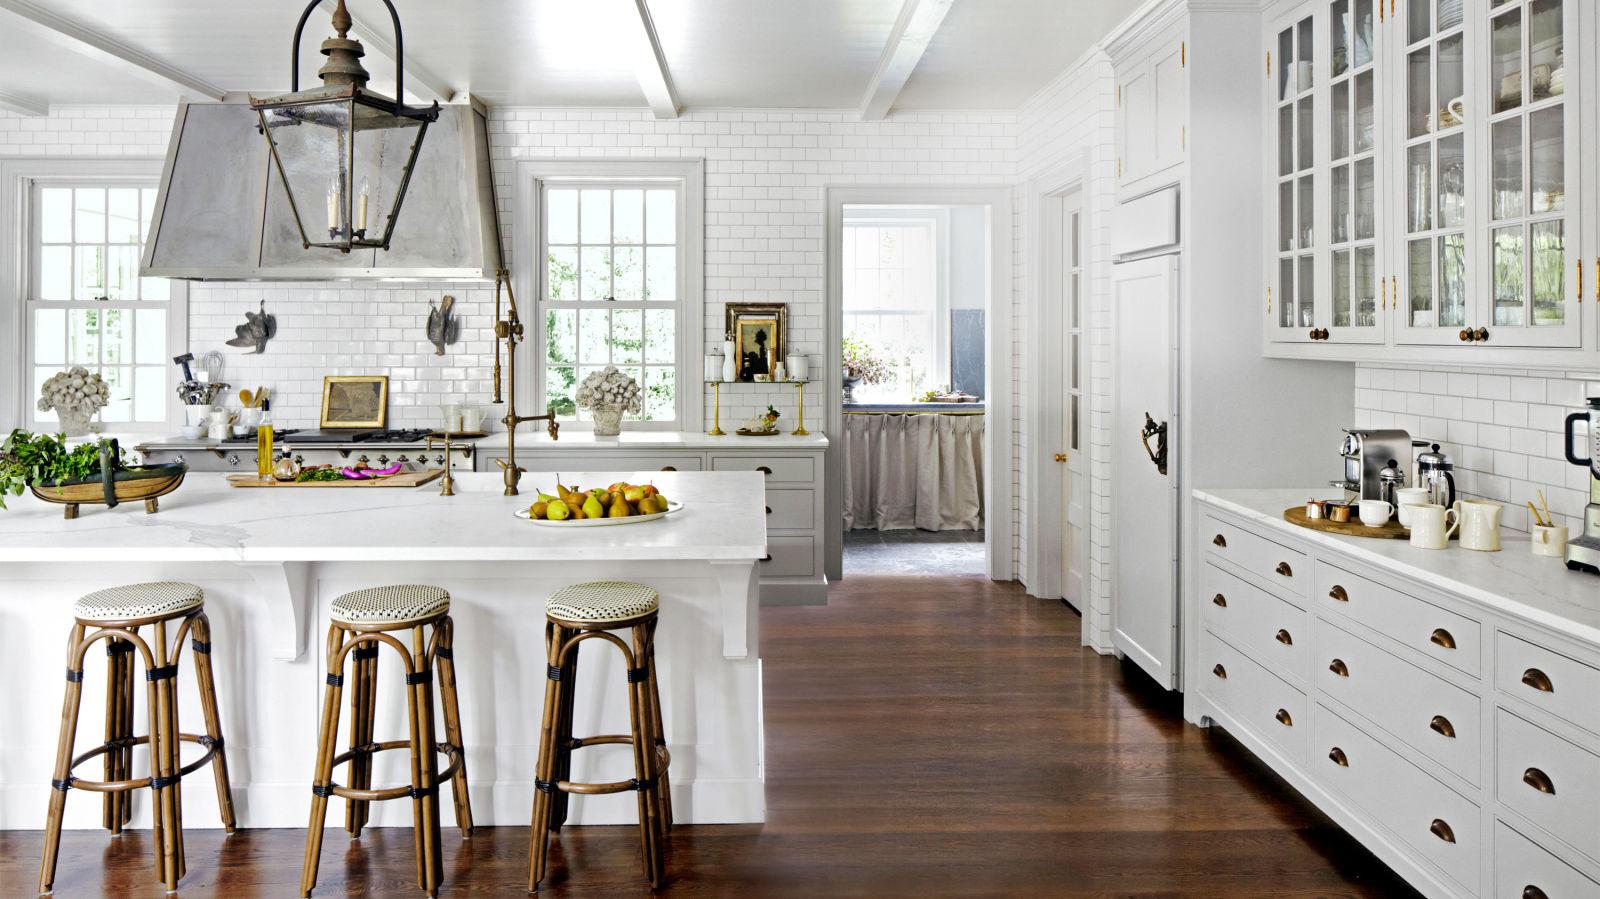 White Kitchen Gallery 24 best white kitchens - pictures of white kitchen design ideas